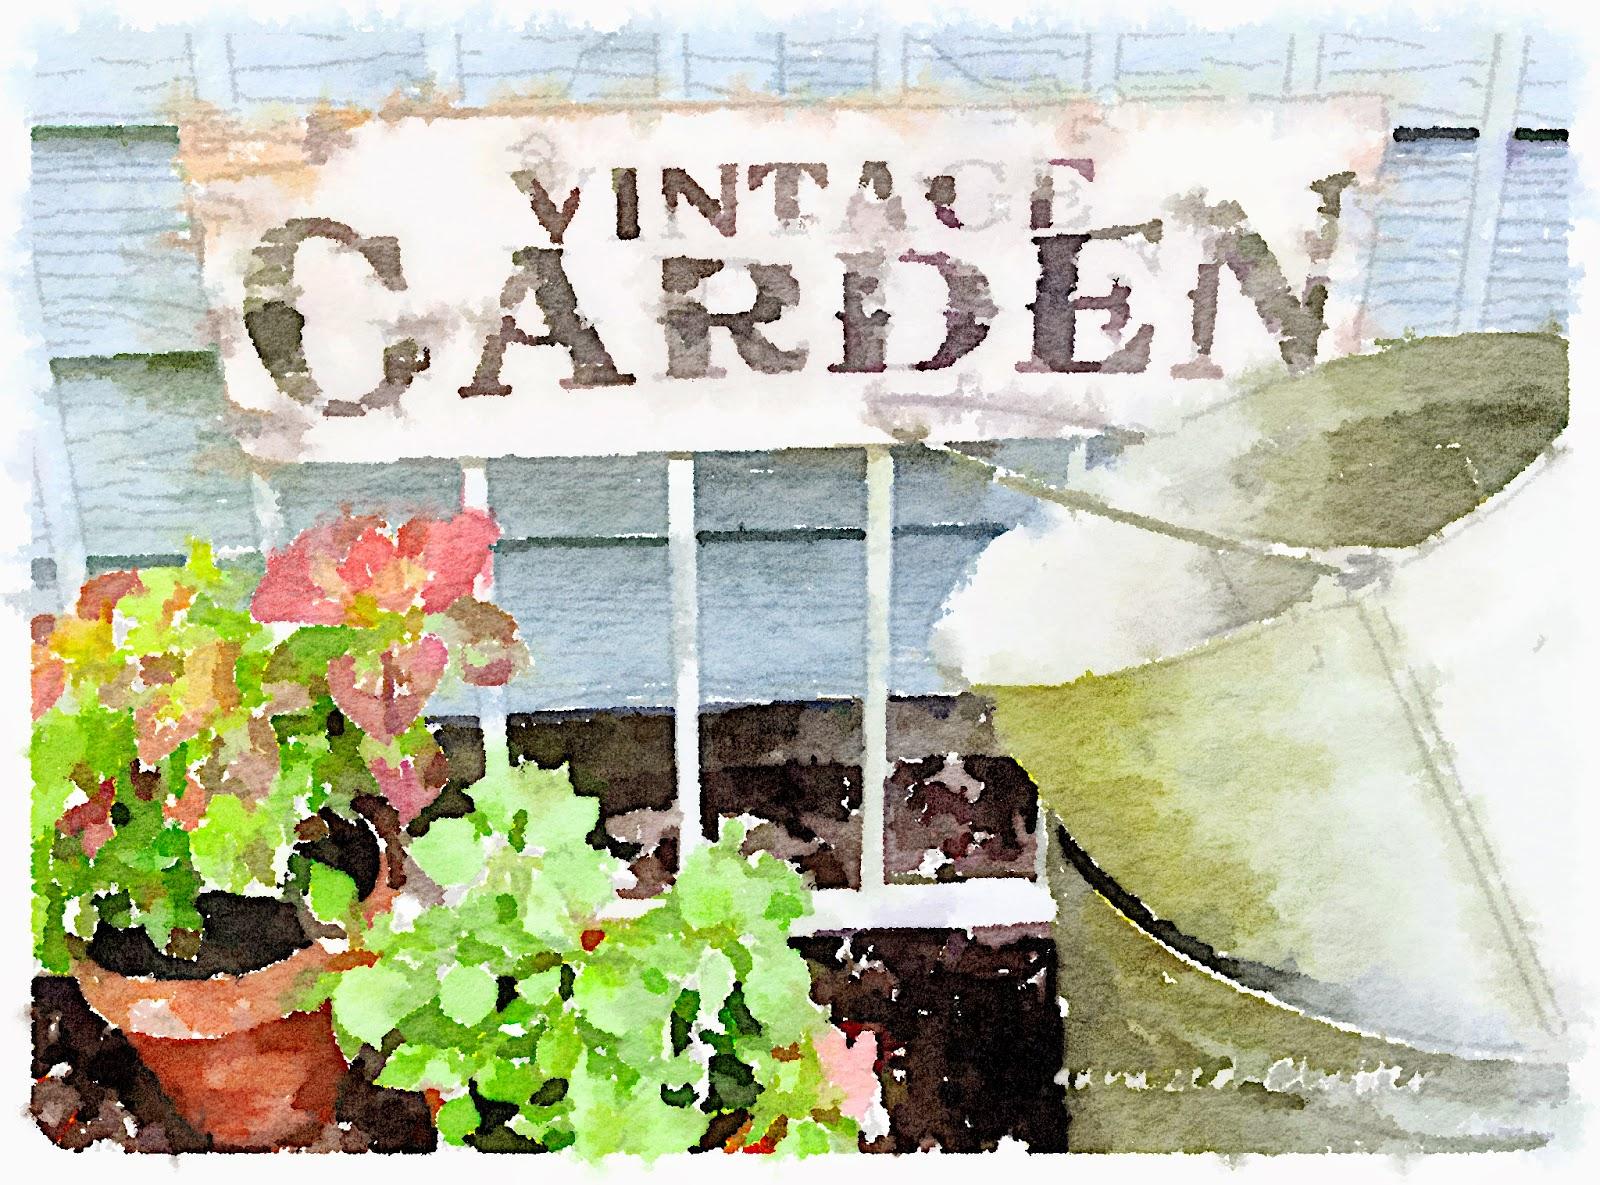 Waterlogue Vintage Garden Sign & Vignette www.organizedclutterqueen.blogspot.com